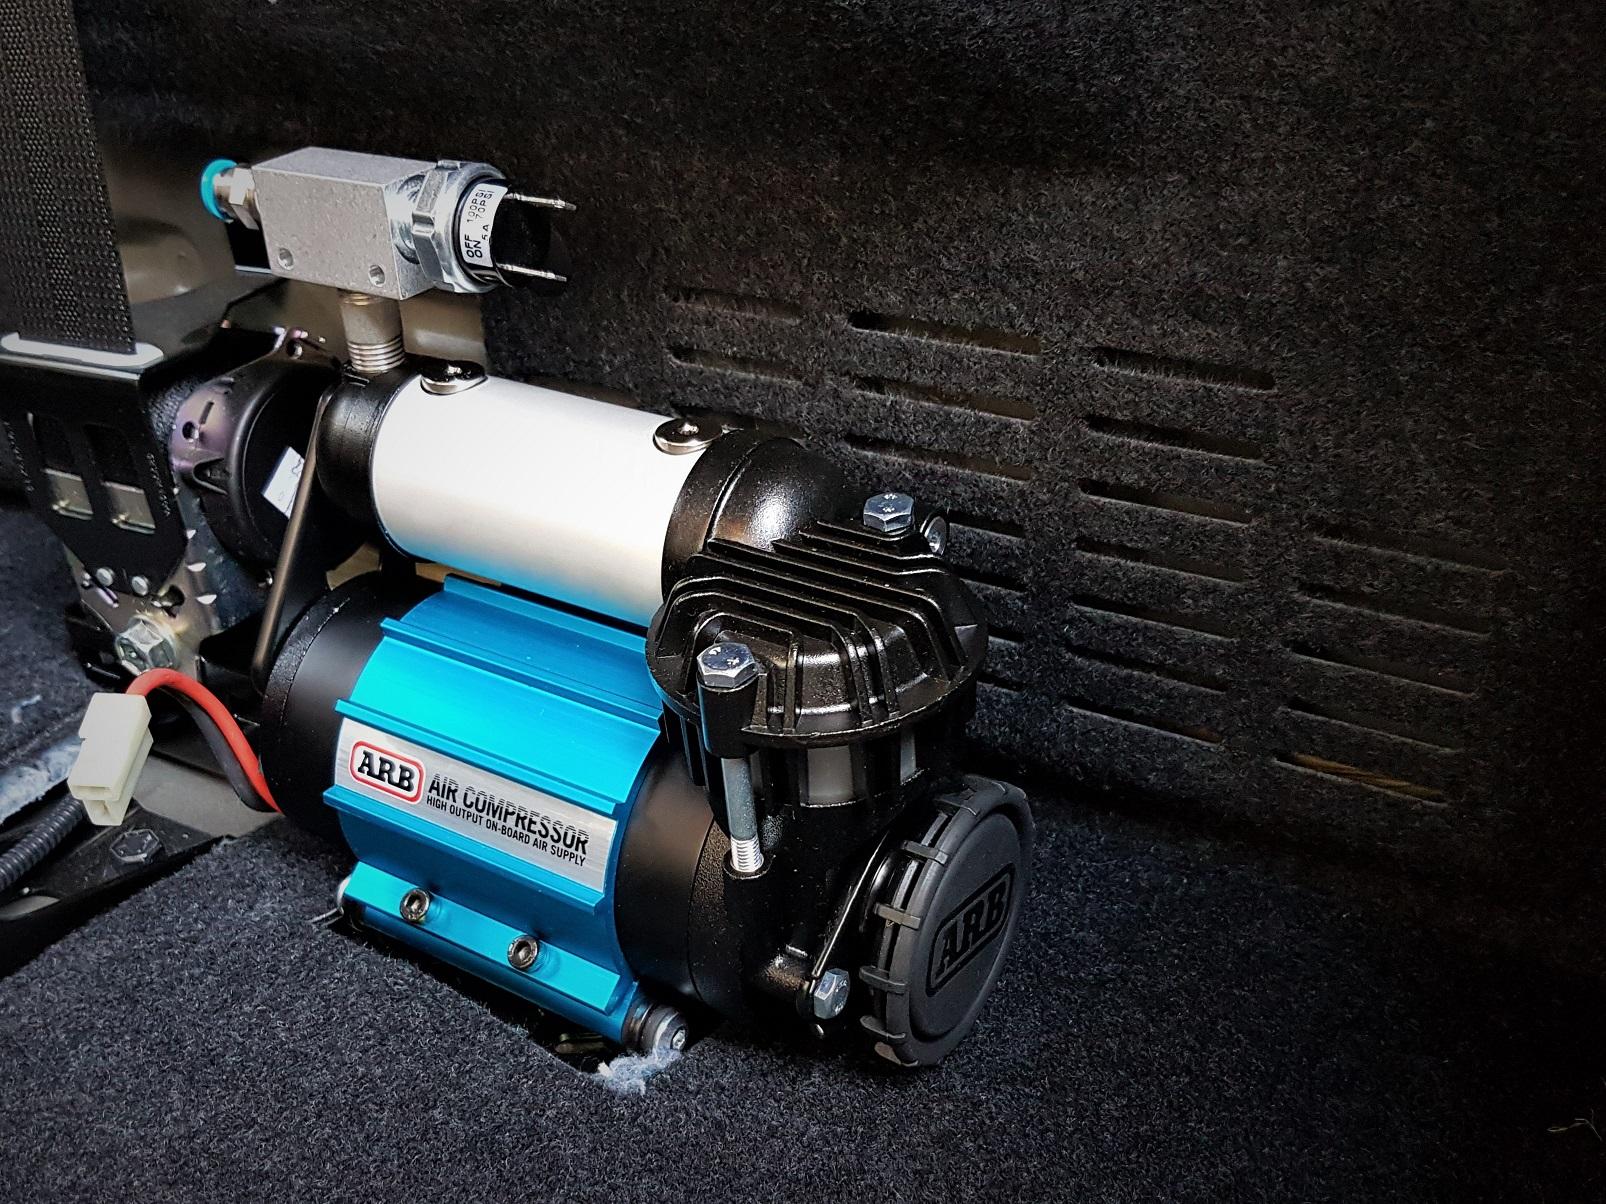 offroad ARB Kompressor CKMA12 Festmontage 75L/Min 4x4 overland Toyota Hilux overland expedition #ProjektBlackwolf